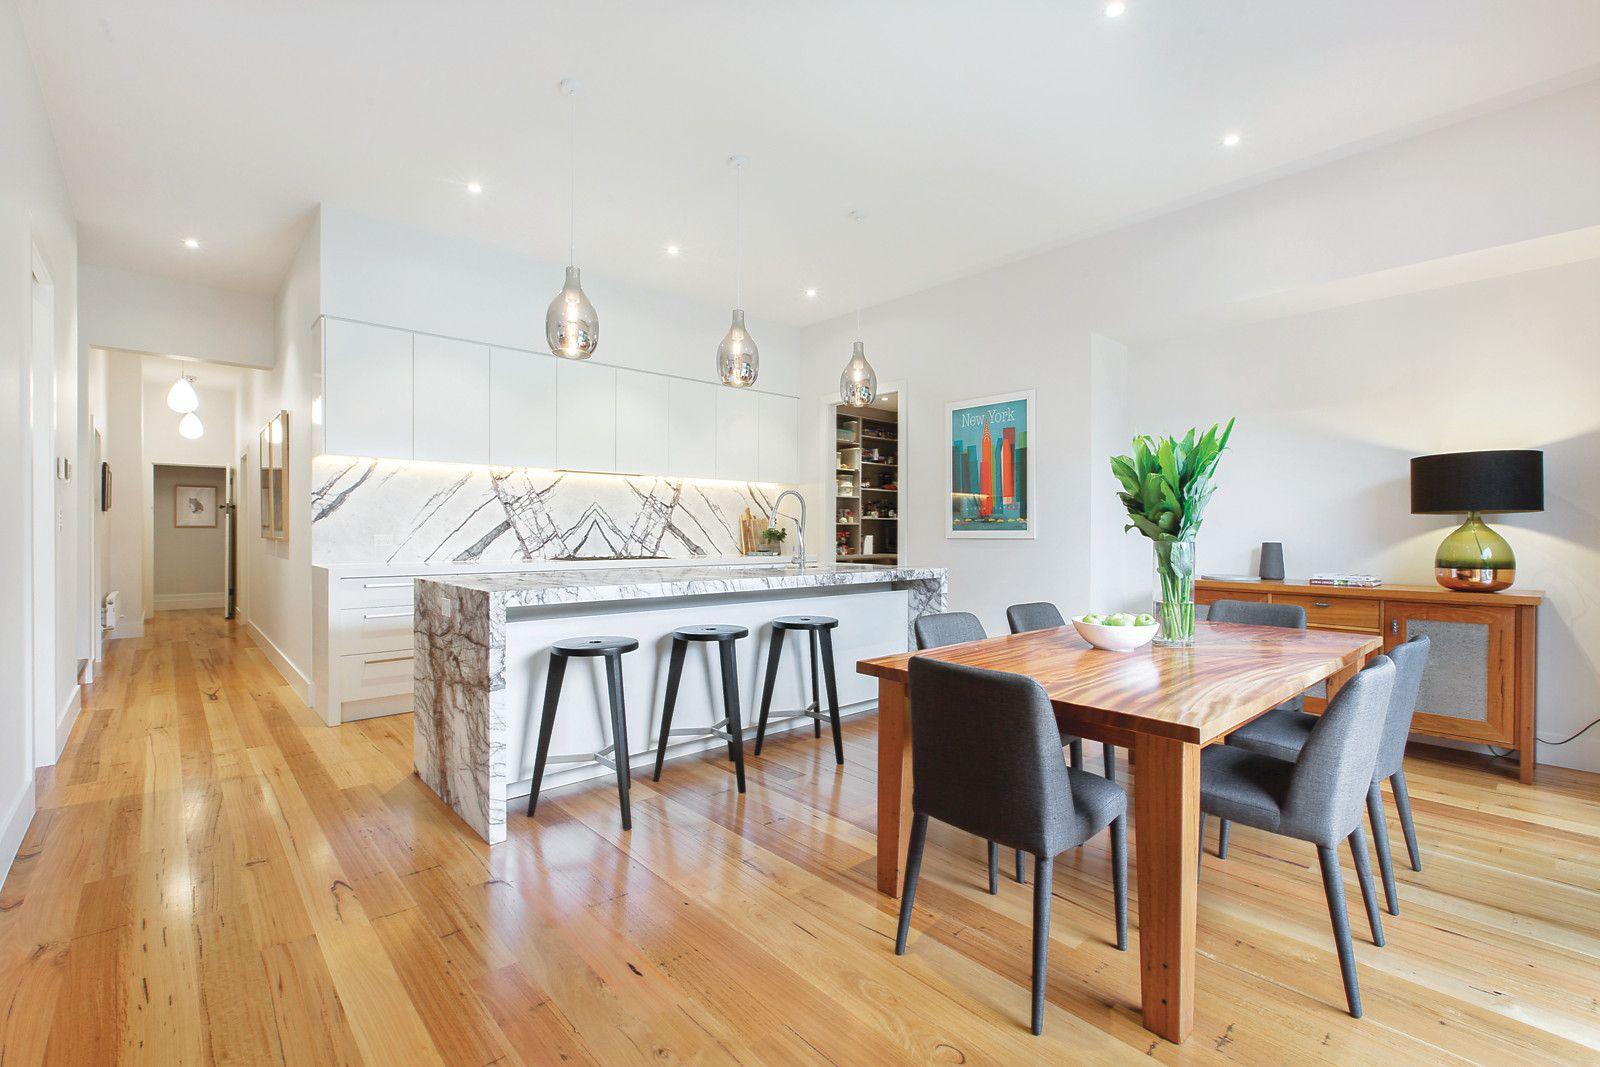 31 John Street Malvern East kitchens, Home